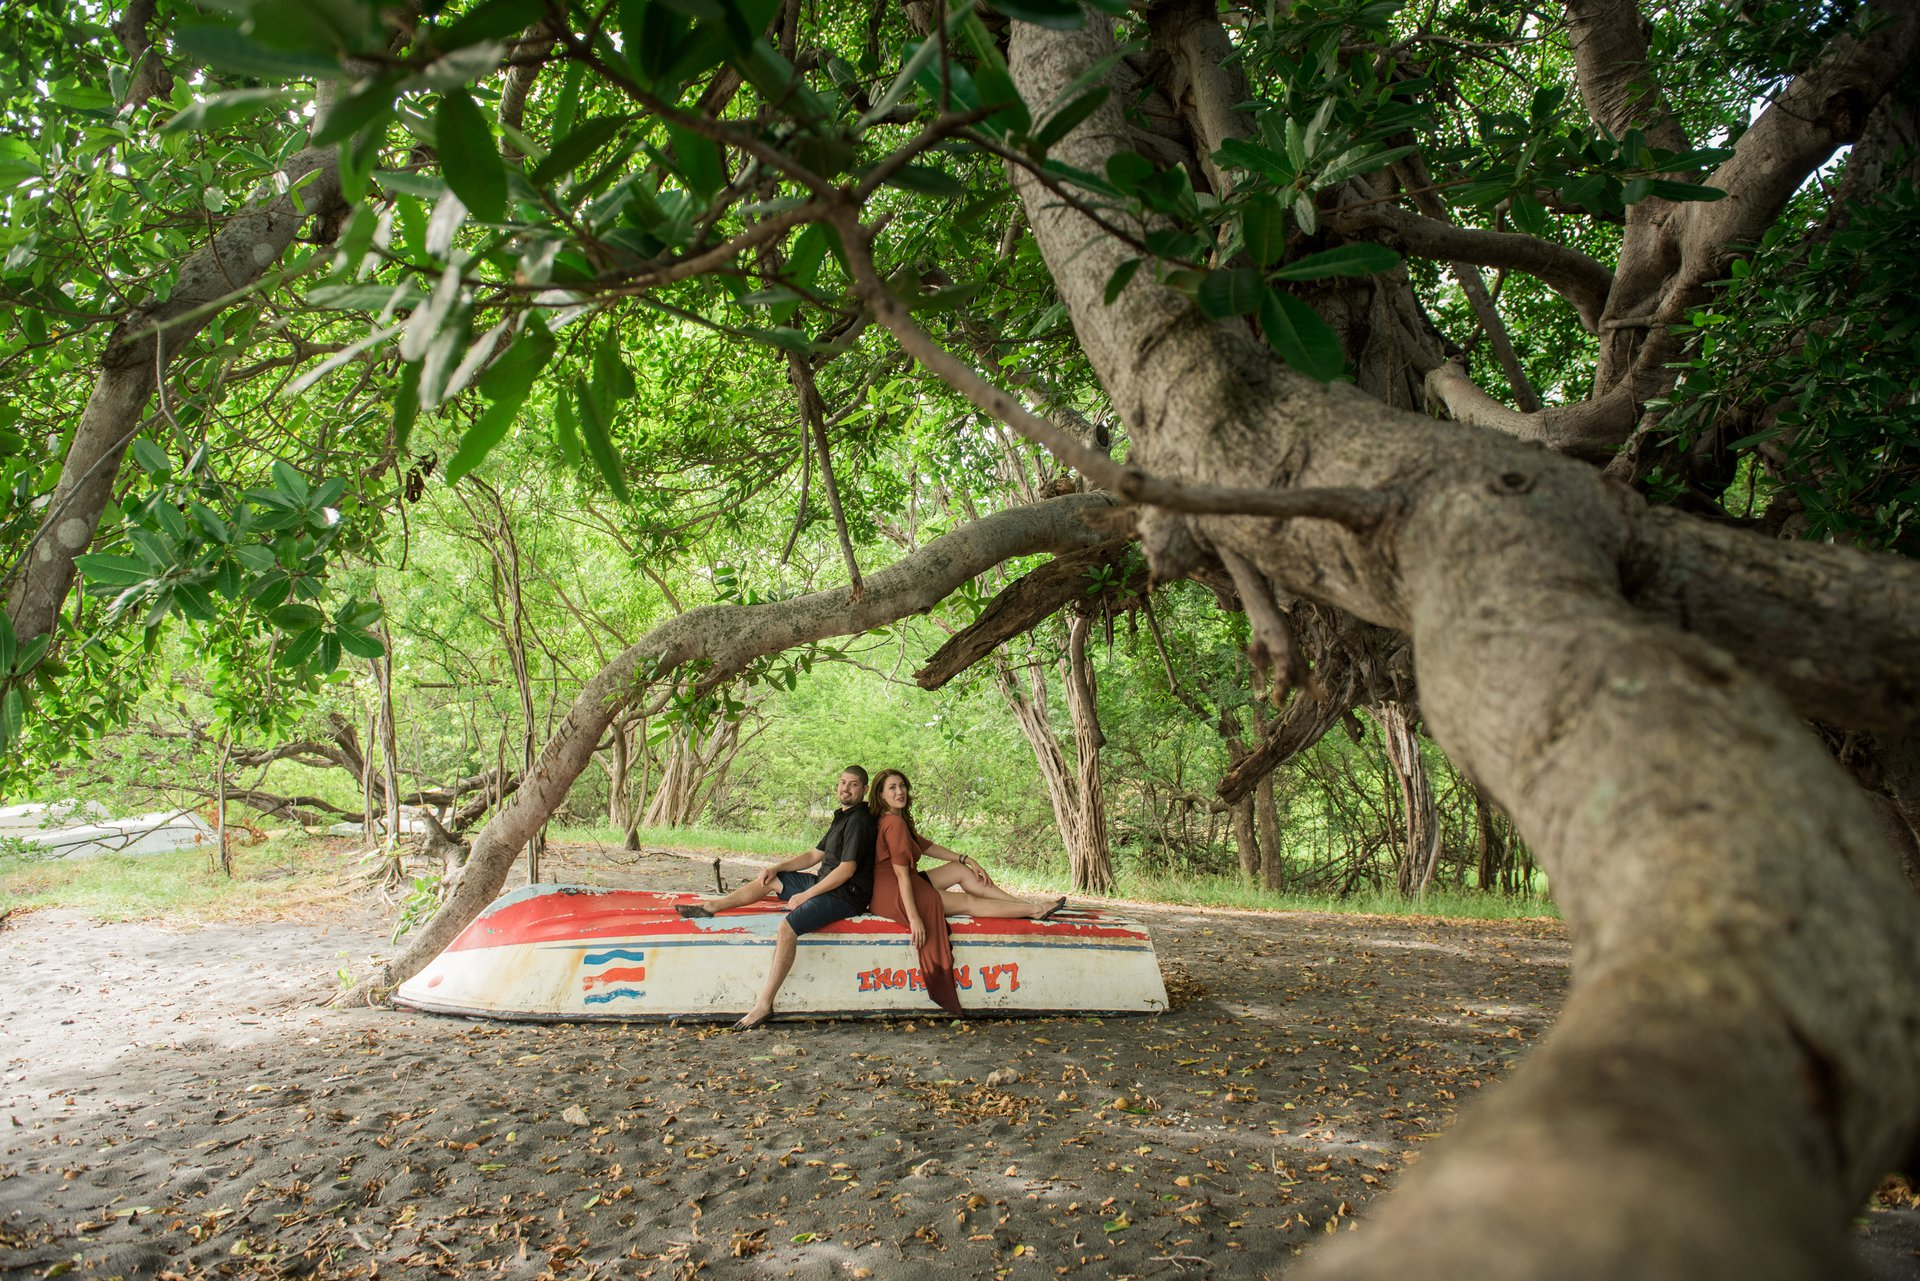 Guanacaste-Costa Rica-travel-story-Flytographer-2